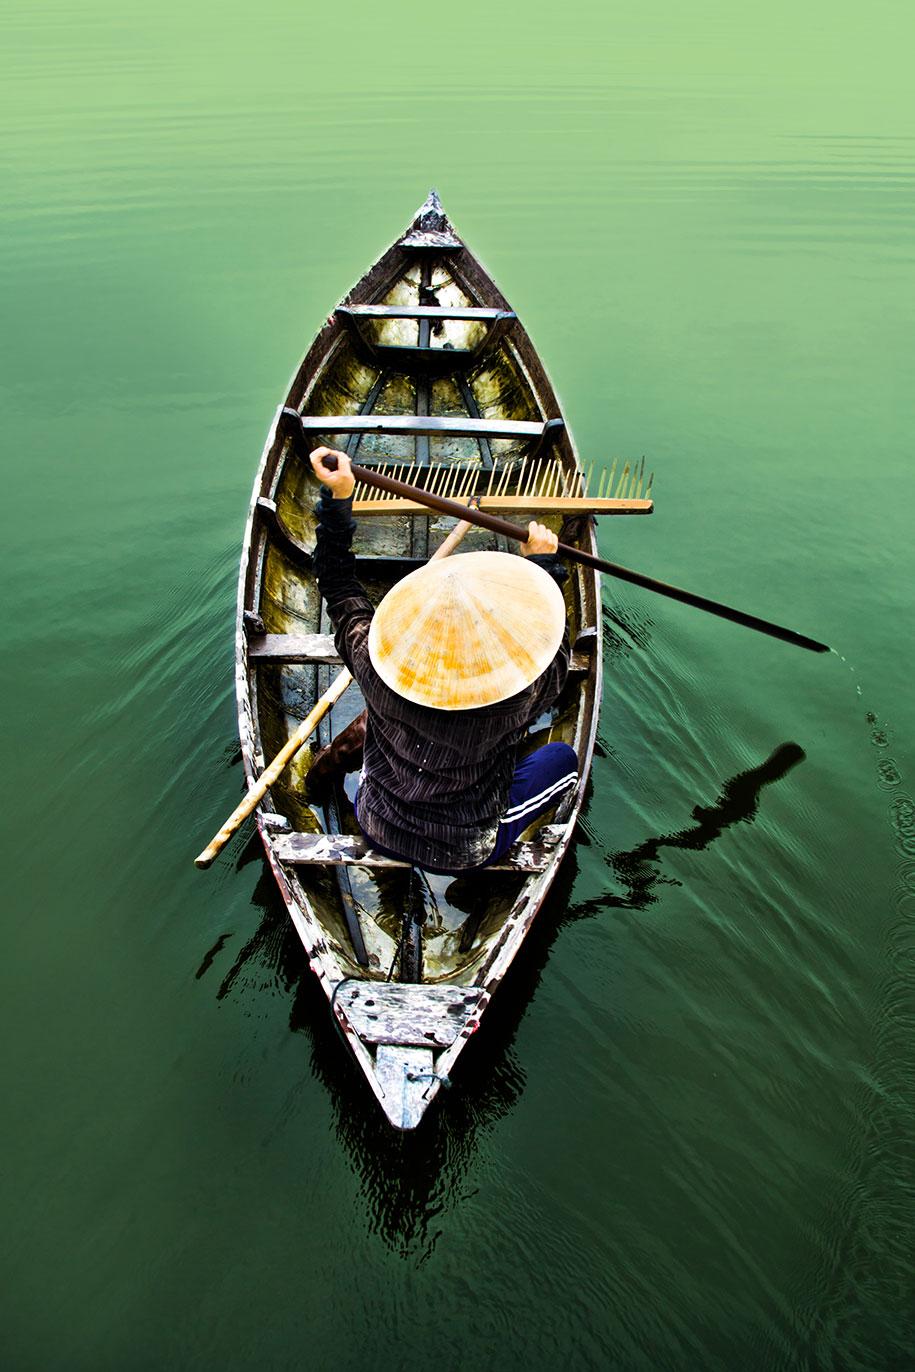 porto-storico-asia-meridionale-fotografia-hoi-an-vietnam-rehahn-croquevielle-10